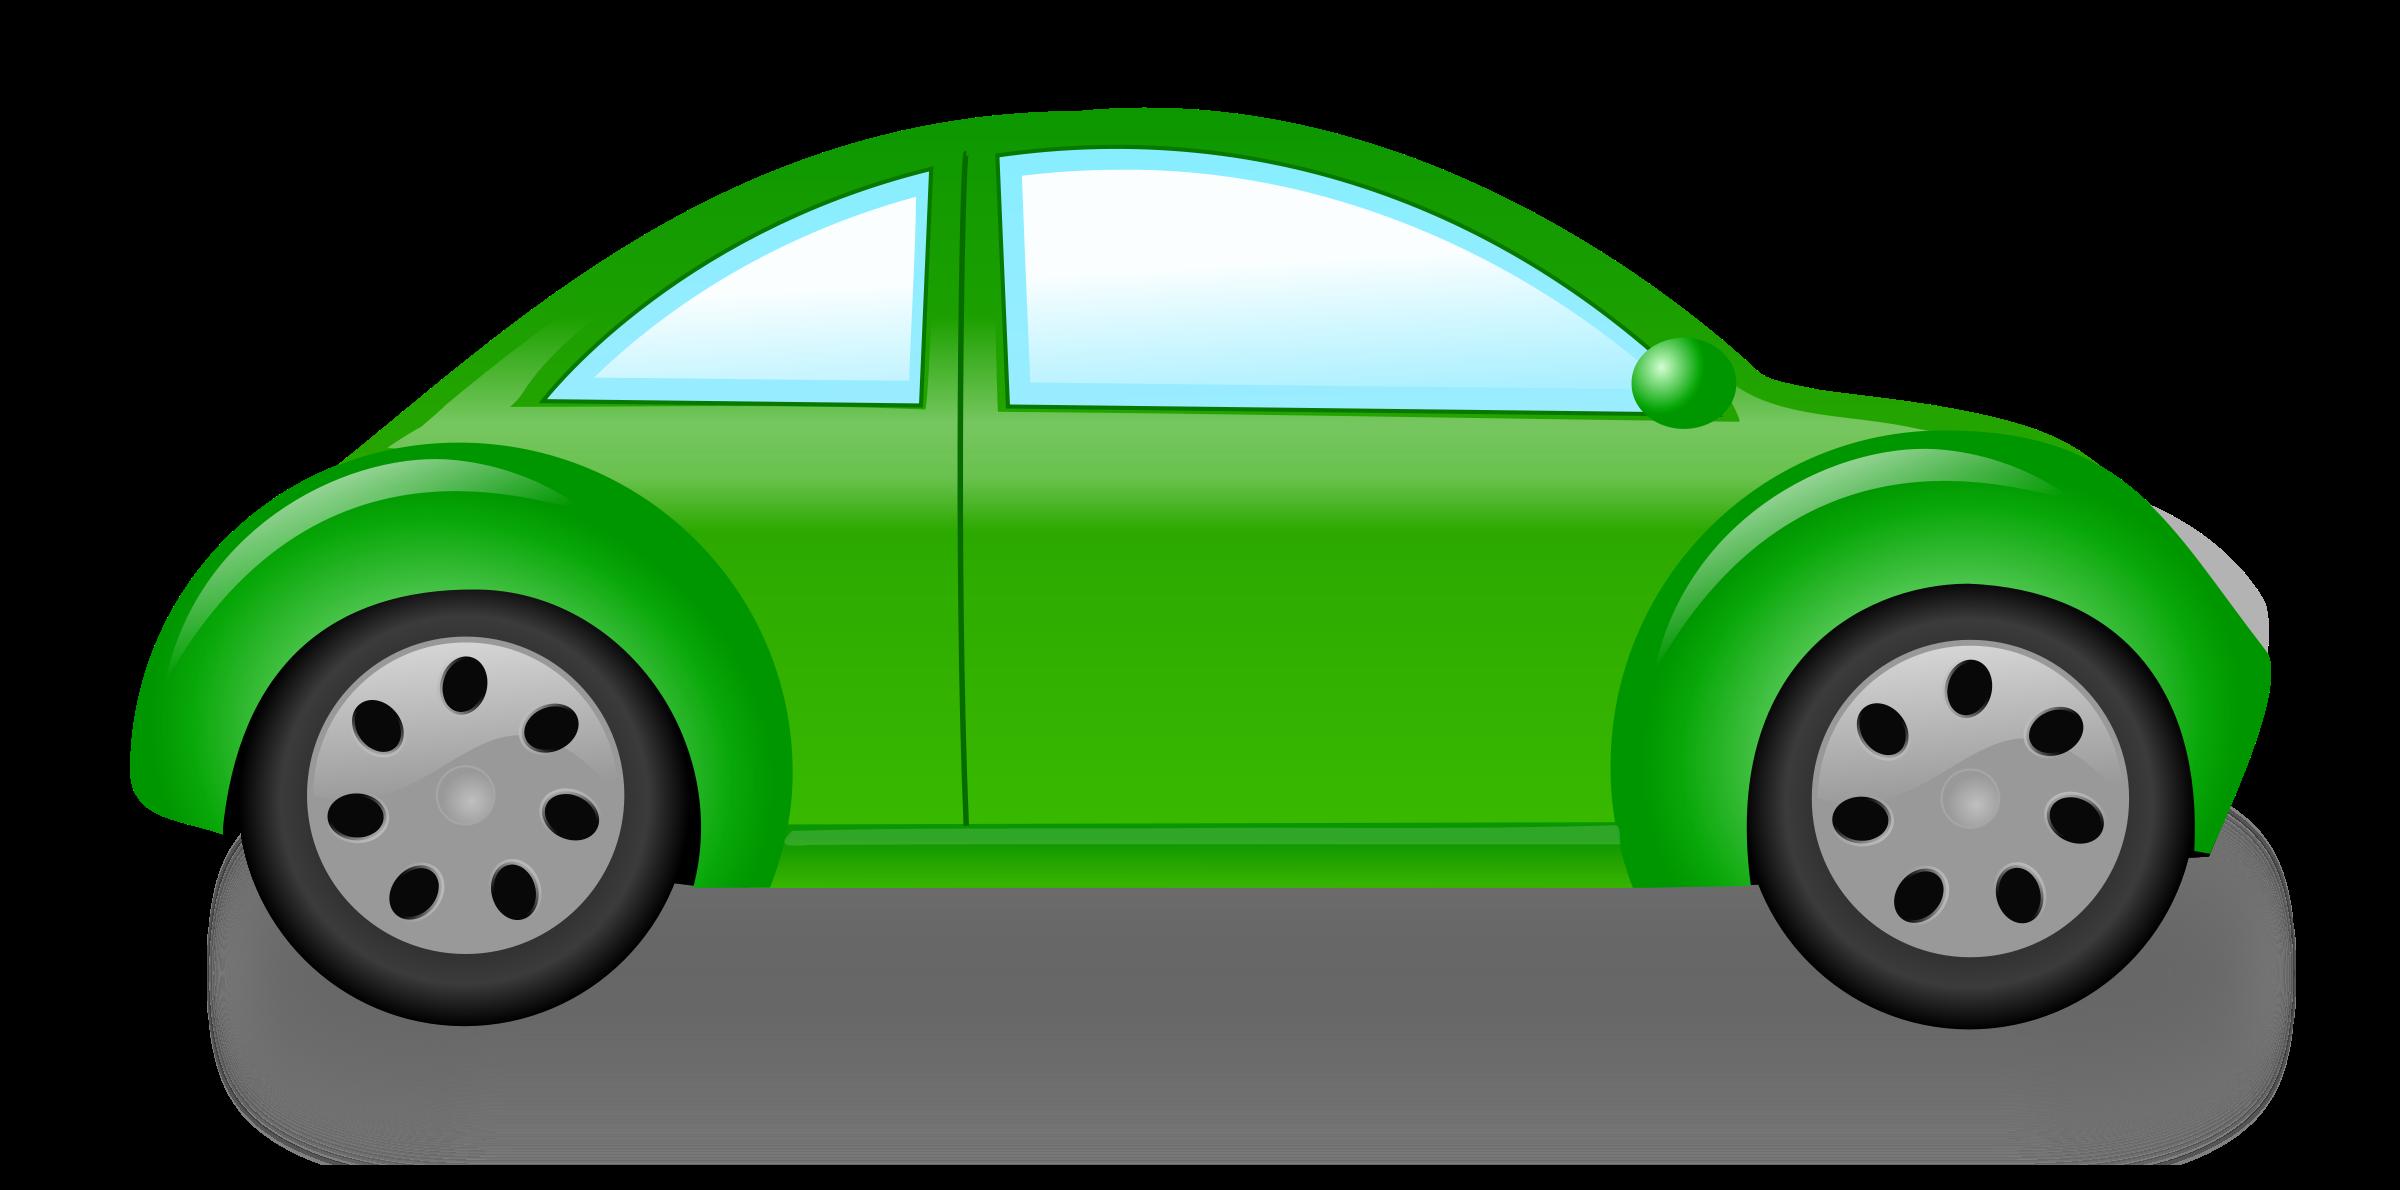 Fast Car Clipart at GetDrawings.com.